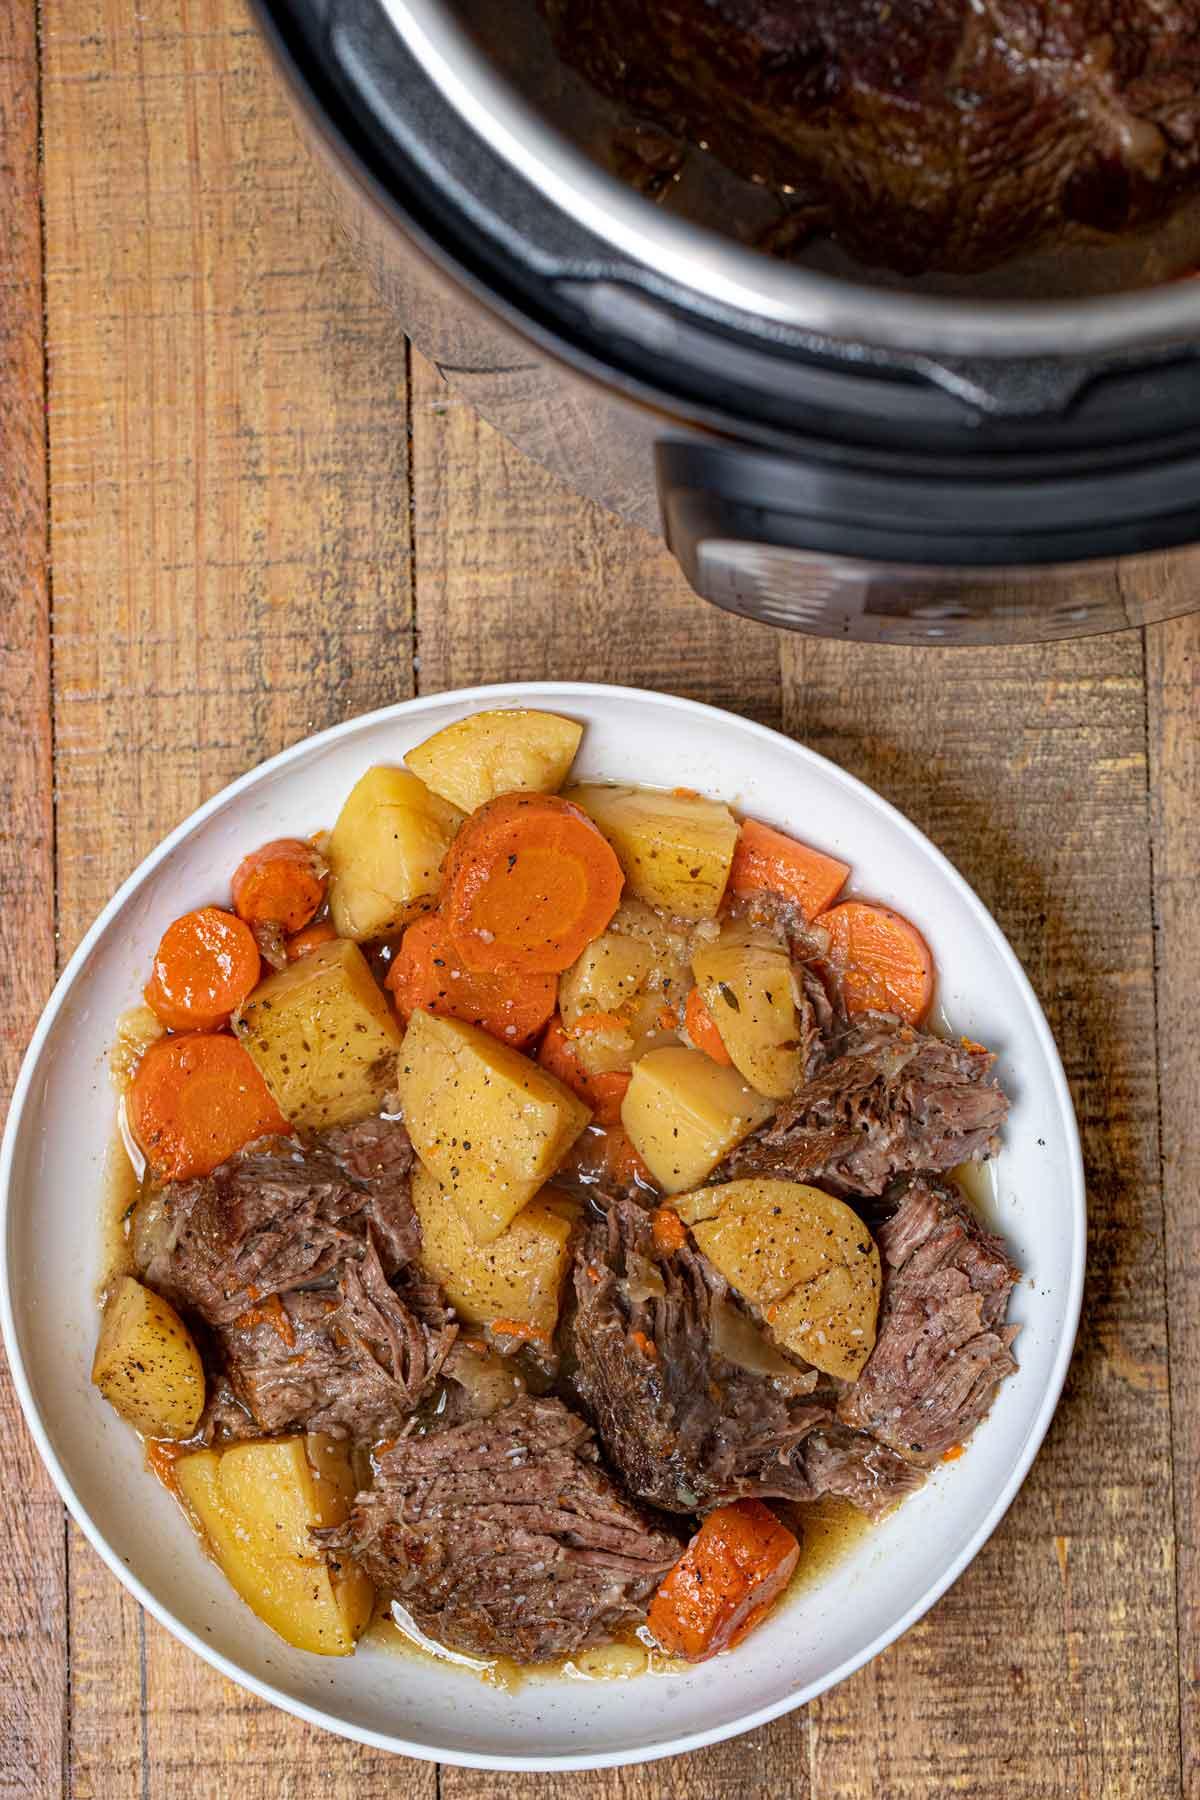 Instant Pot Beef Pot Roast on plate